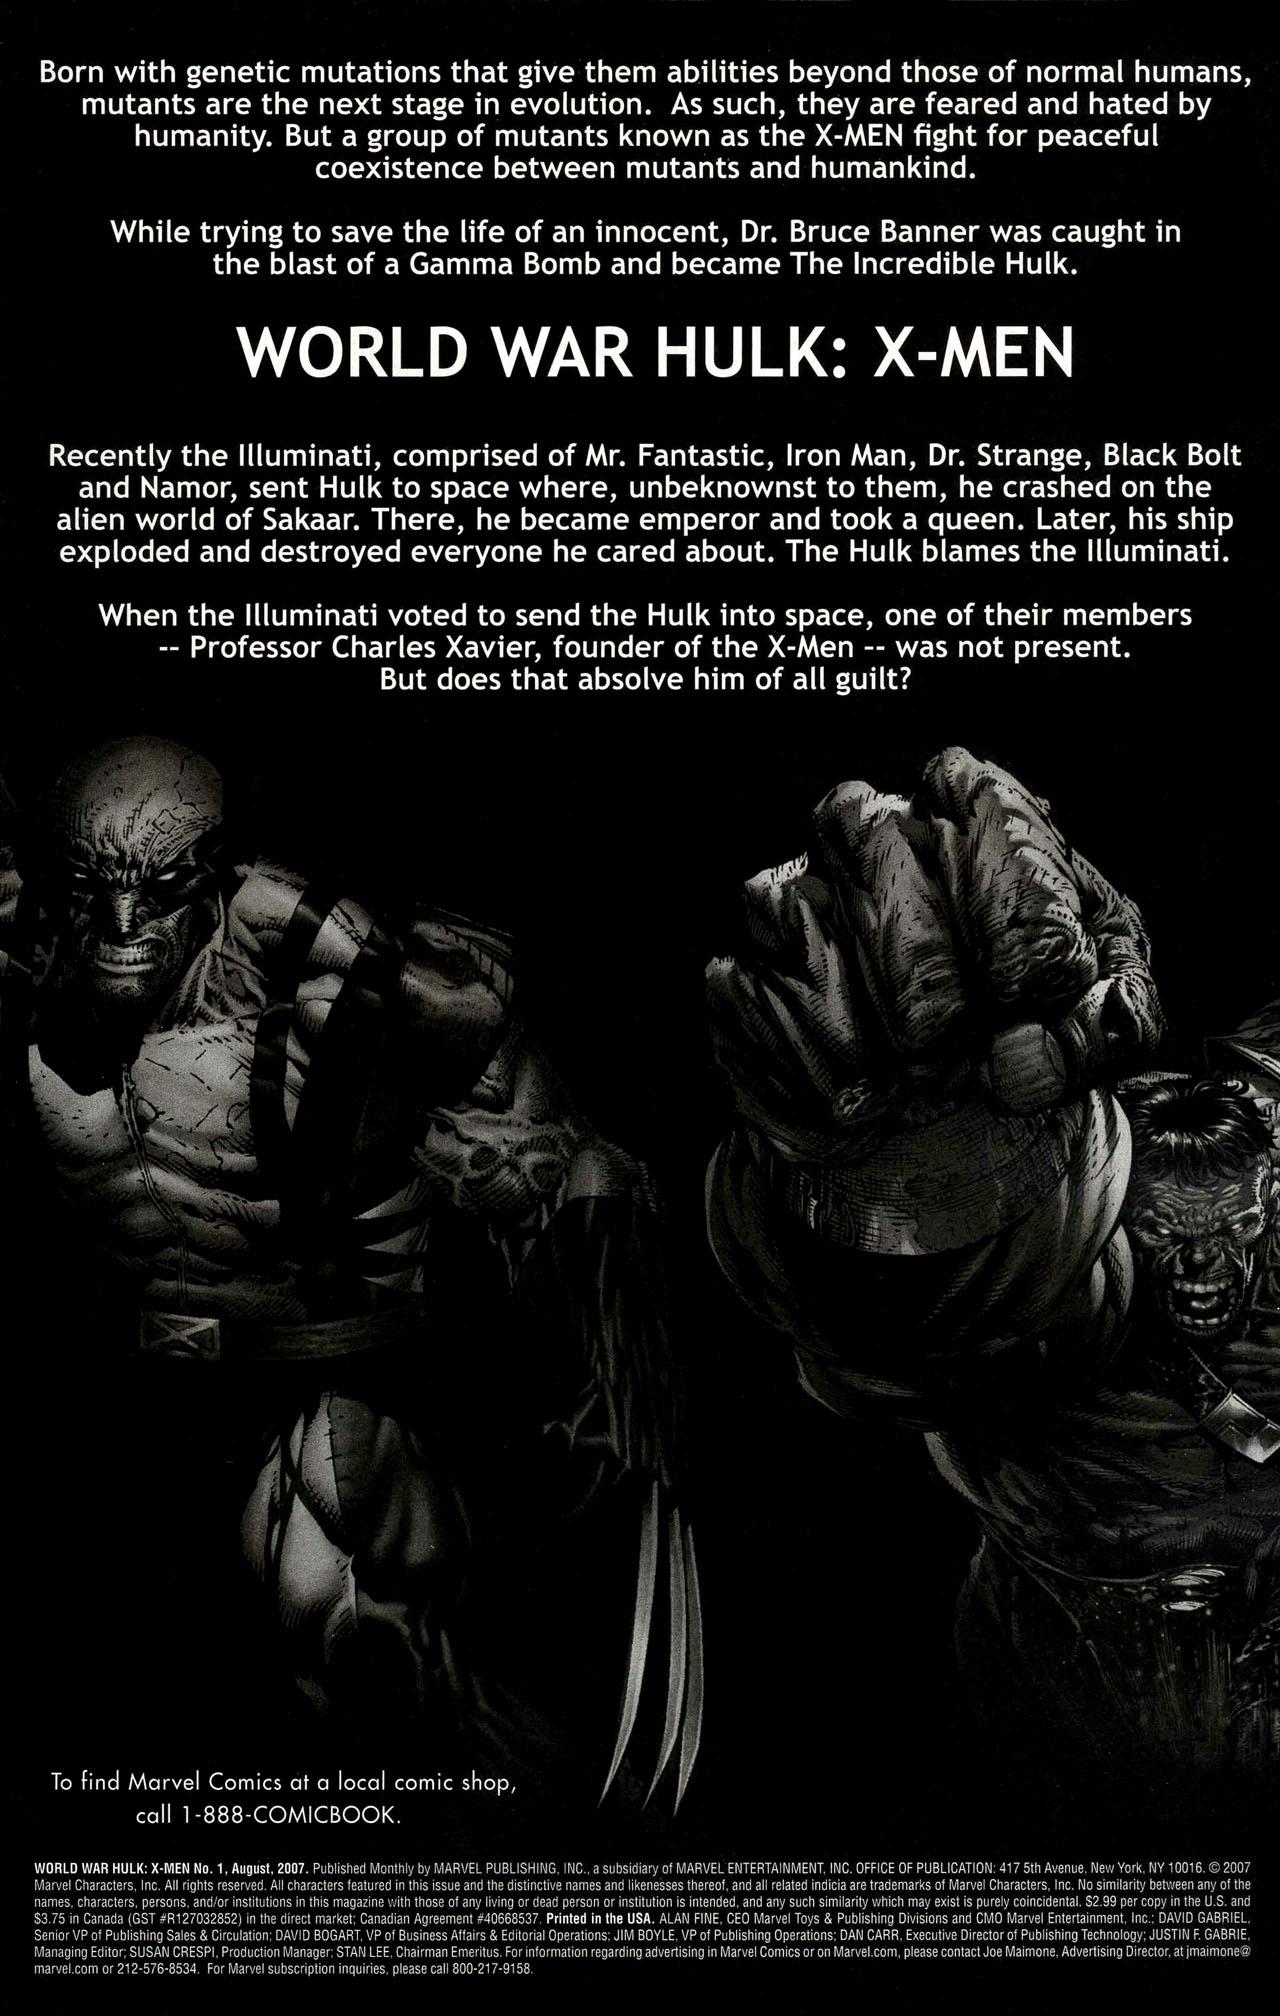 Read online World War Hulk: X-Men comic -  Issue #1 - 2